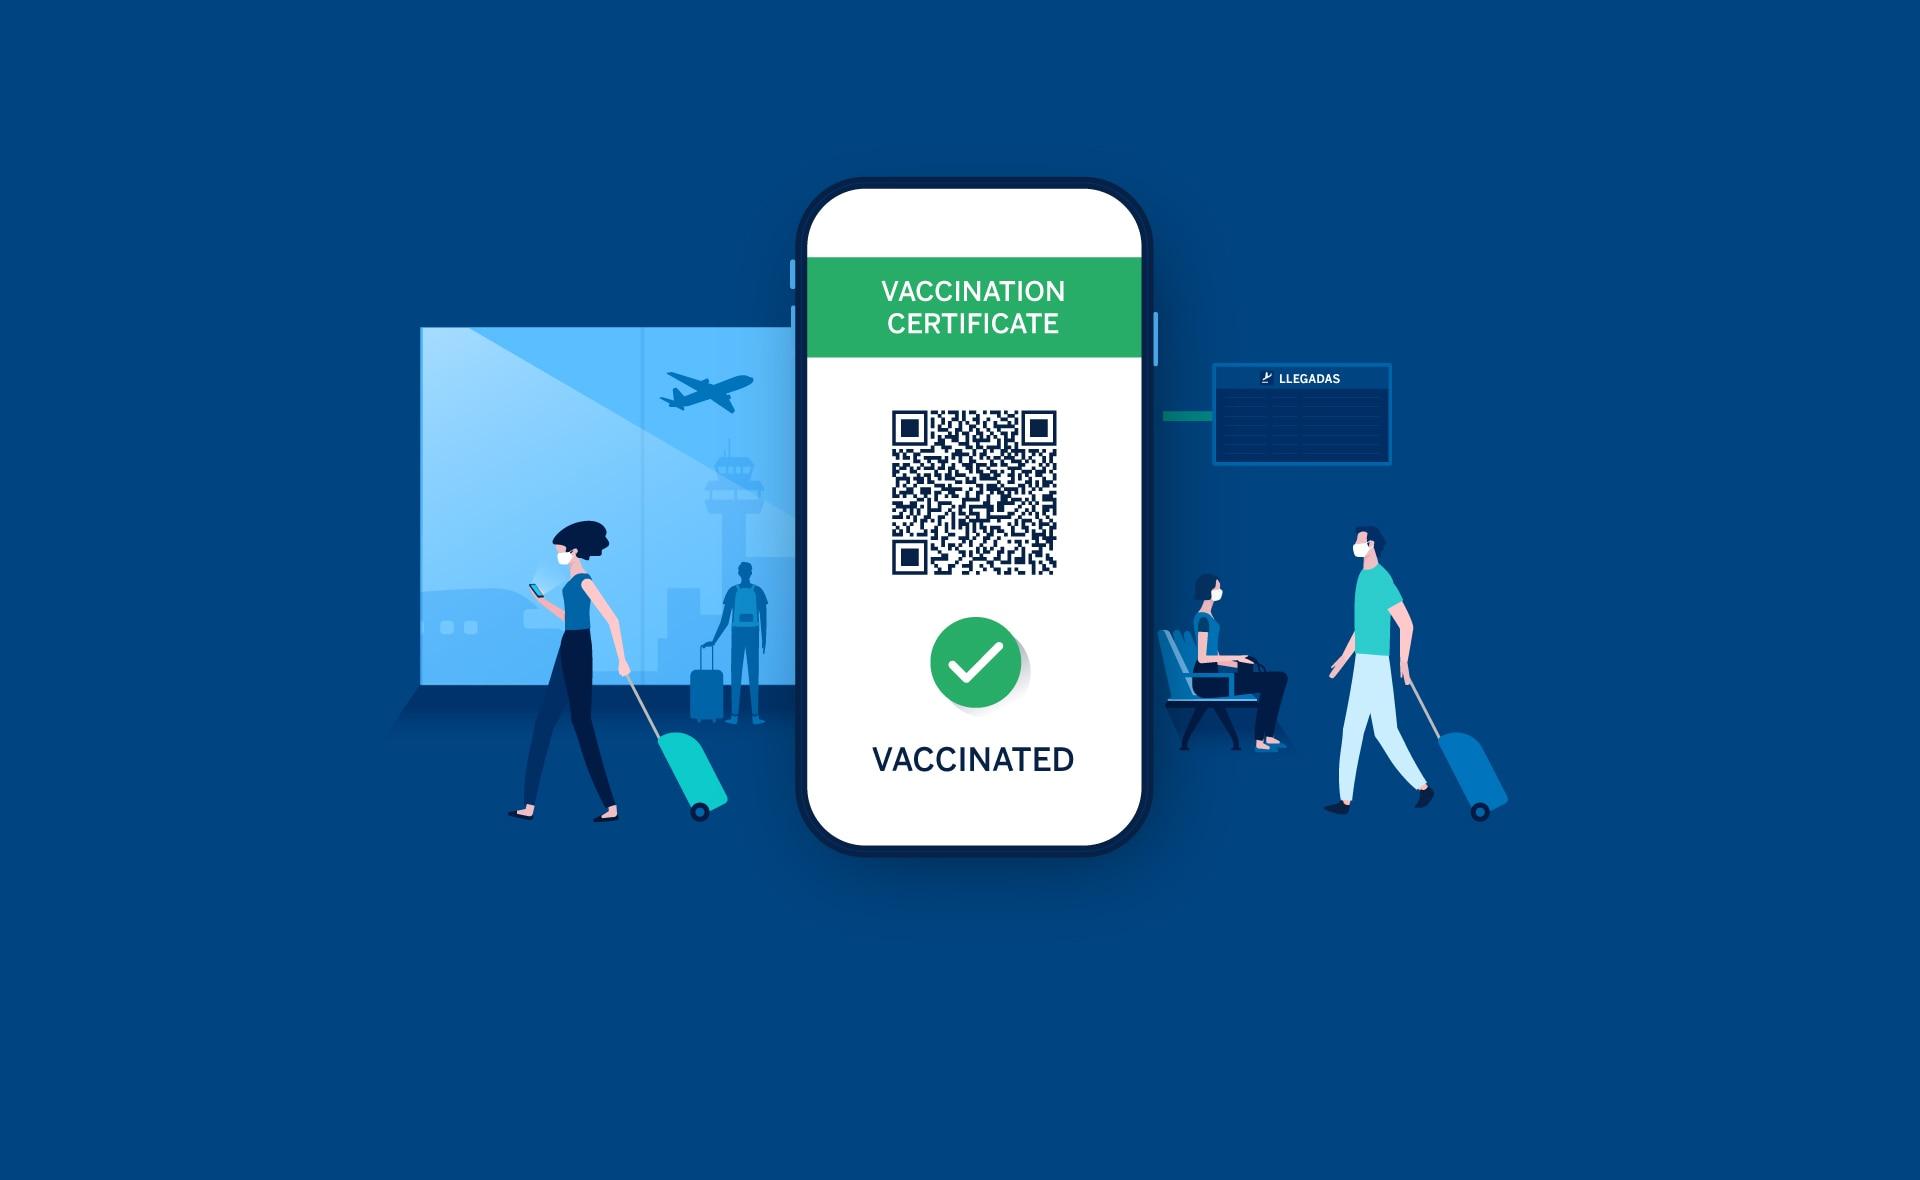 pasaporte_covid_viajar-verano-coronavirus-documentacion-necesaria-aeropuerto